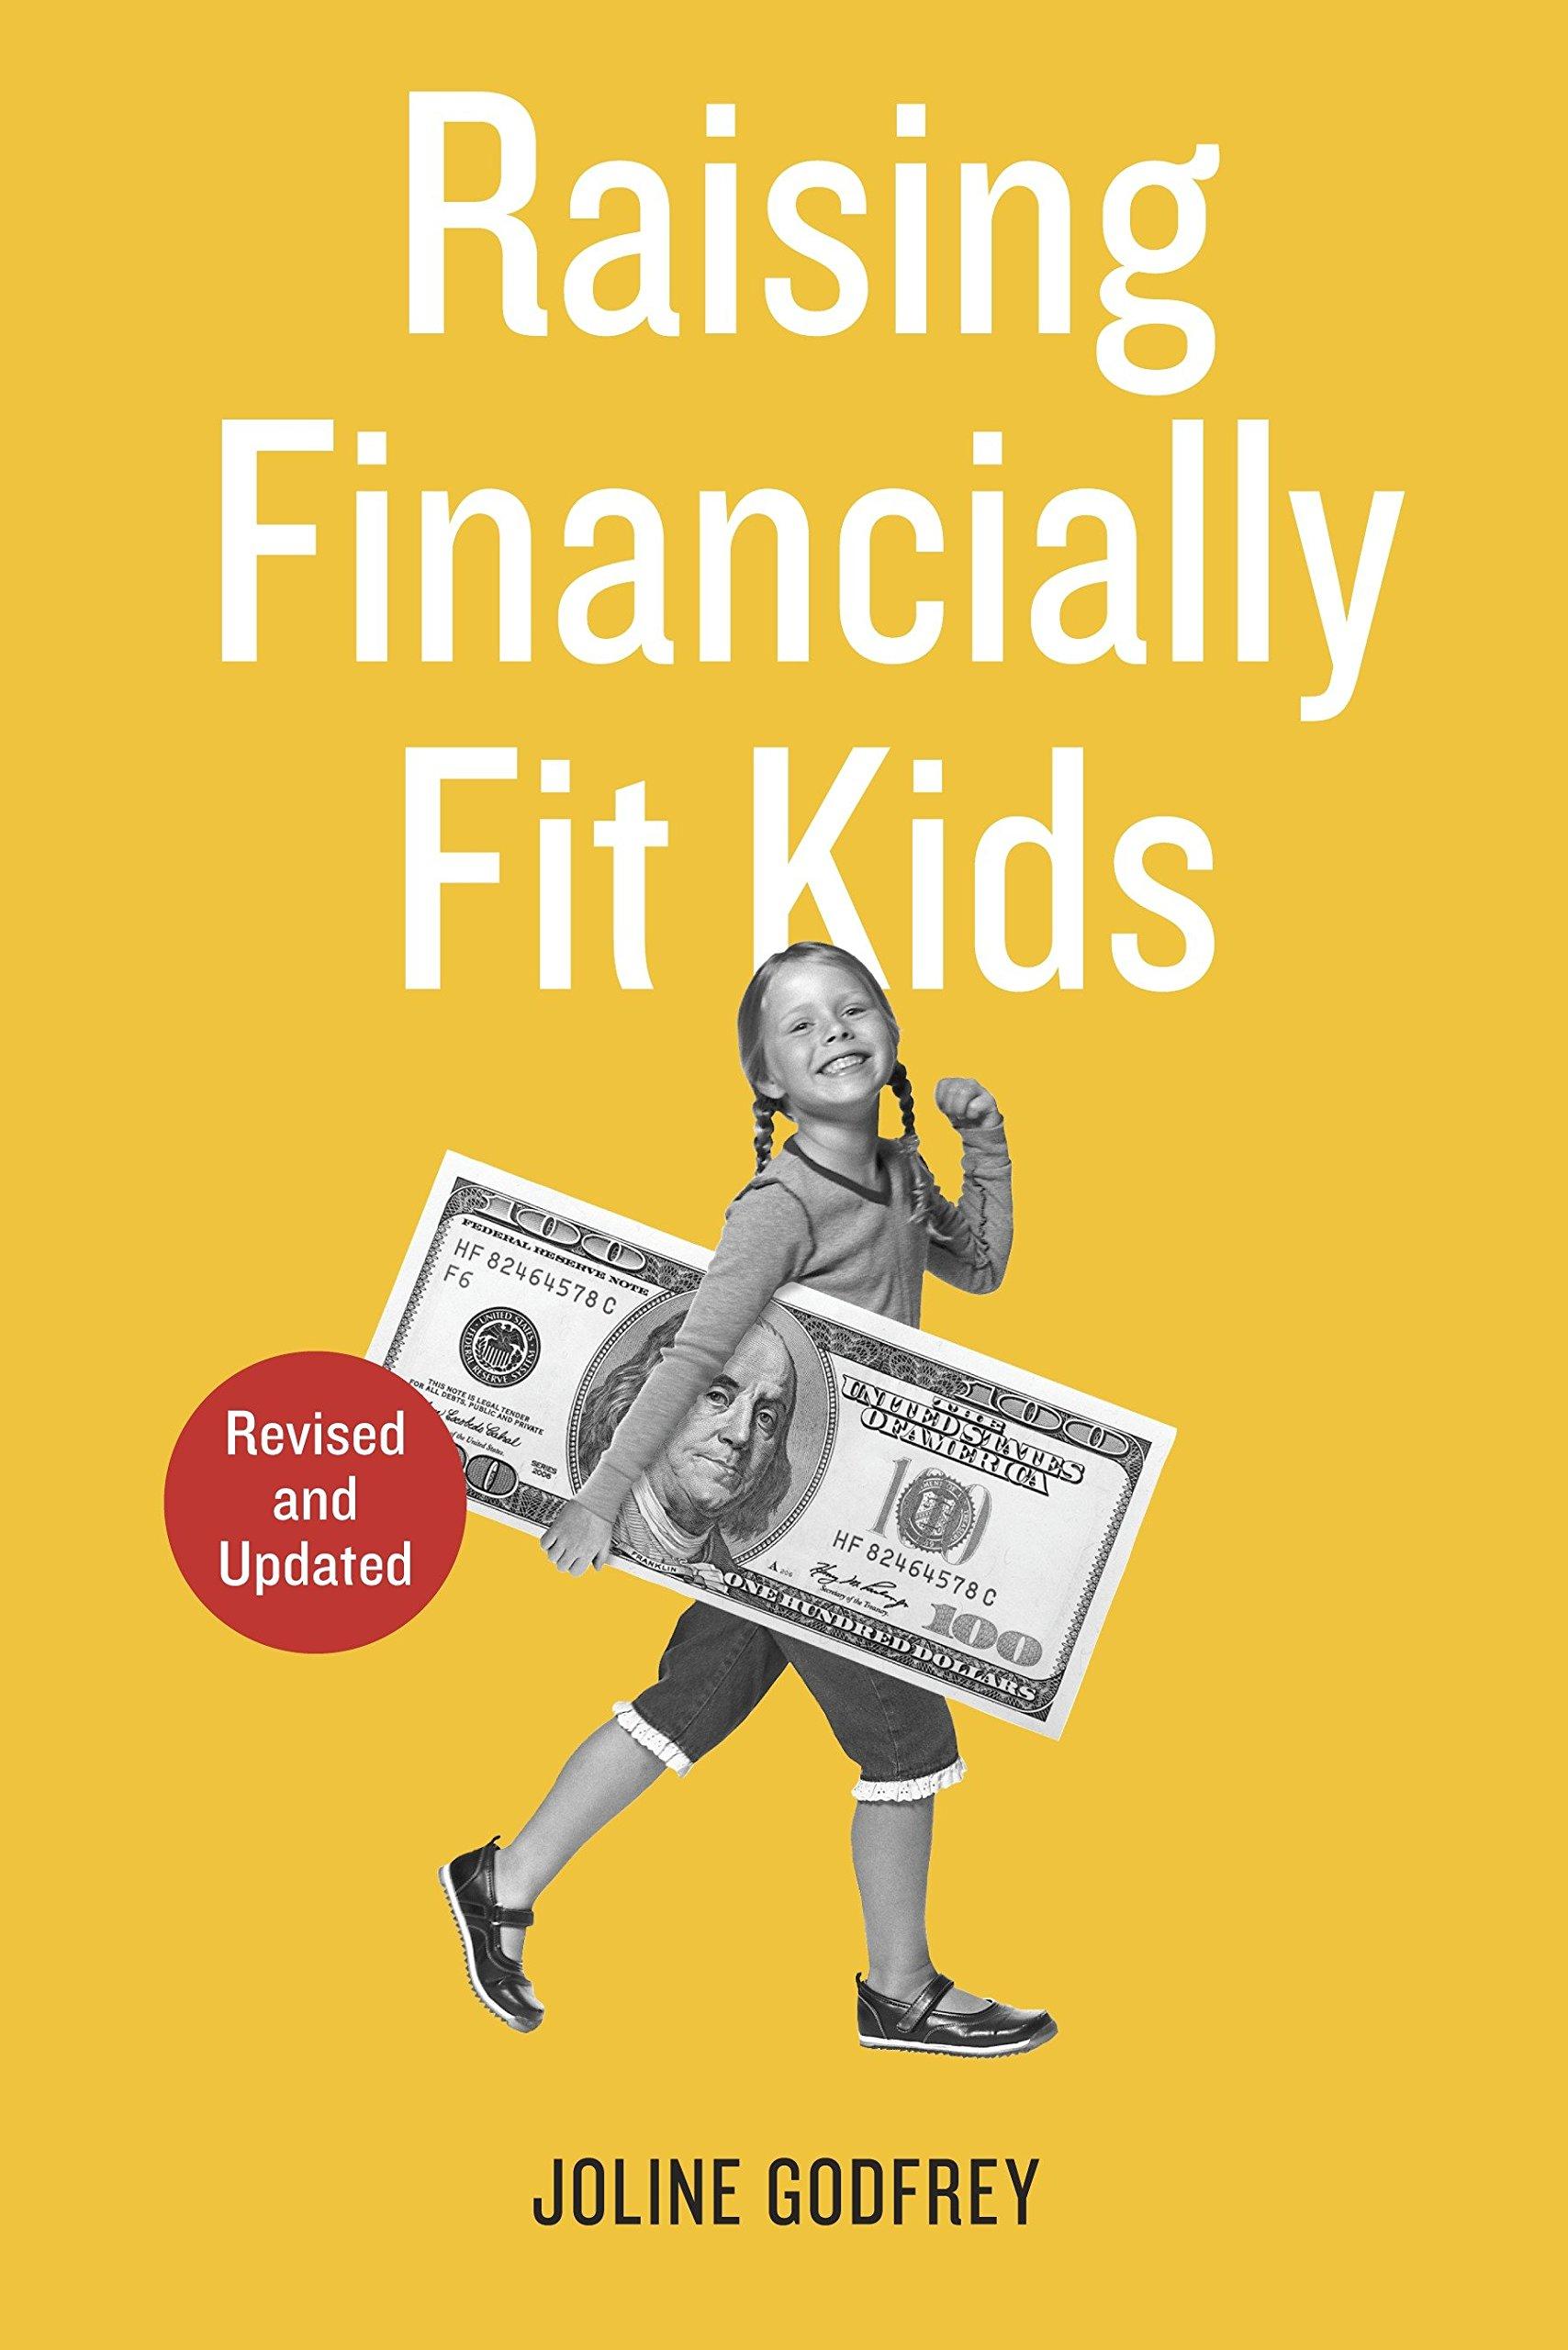 Raising Financially Fit Kids - Godfrey, Joline.Raising Financially Fit Kids.New York: Ten Speed Press. 2003, 2013.